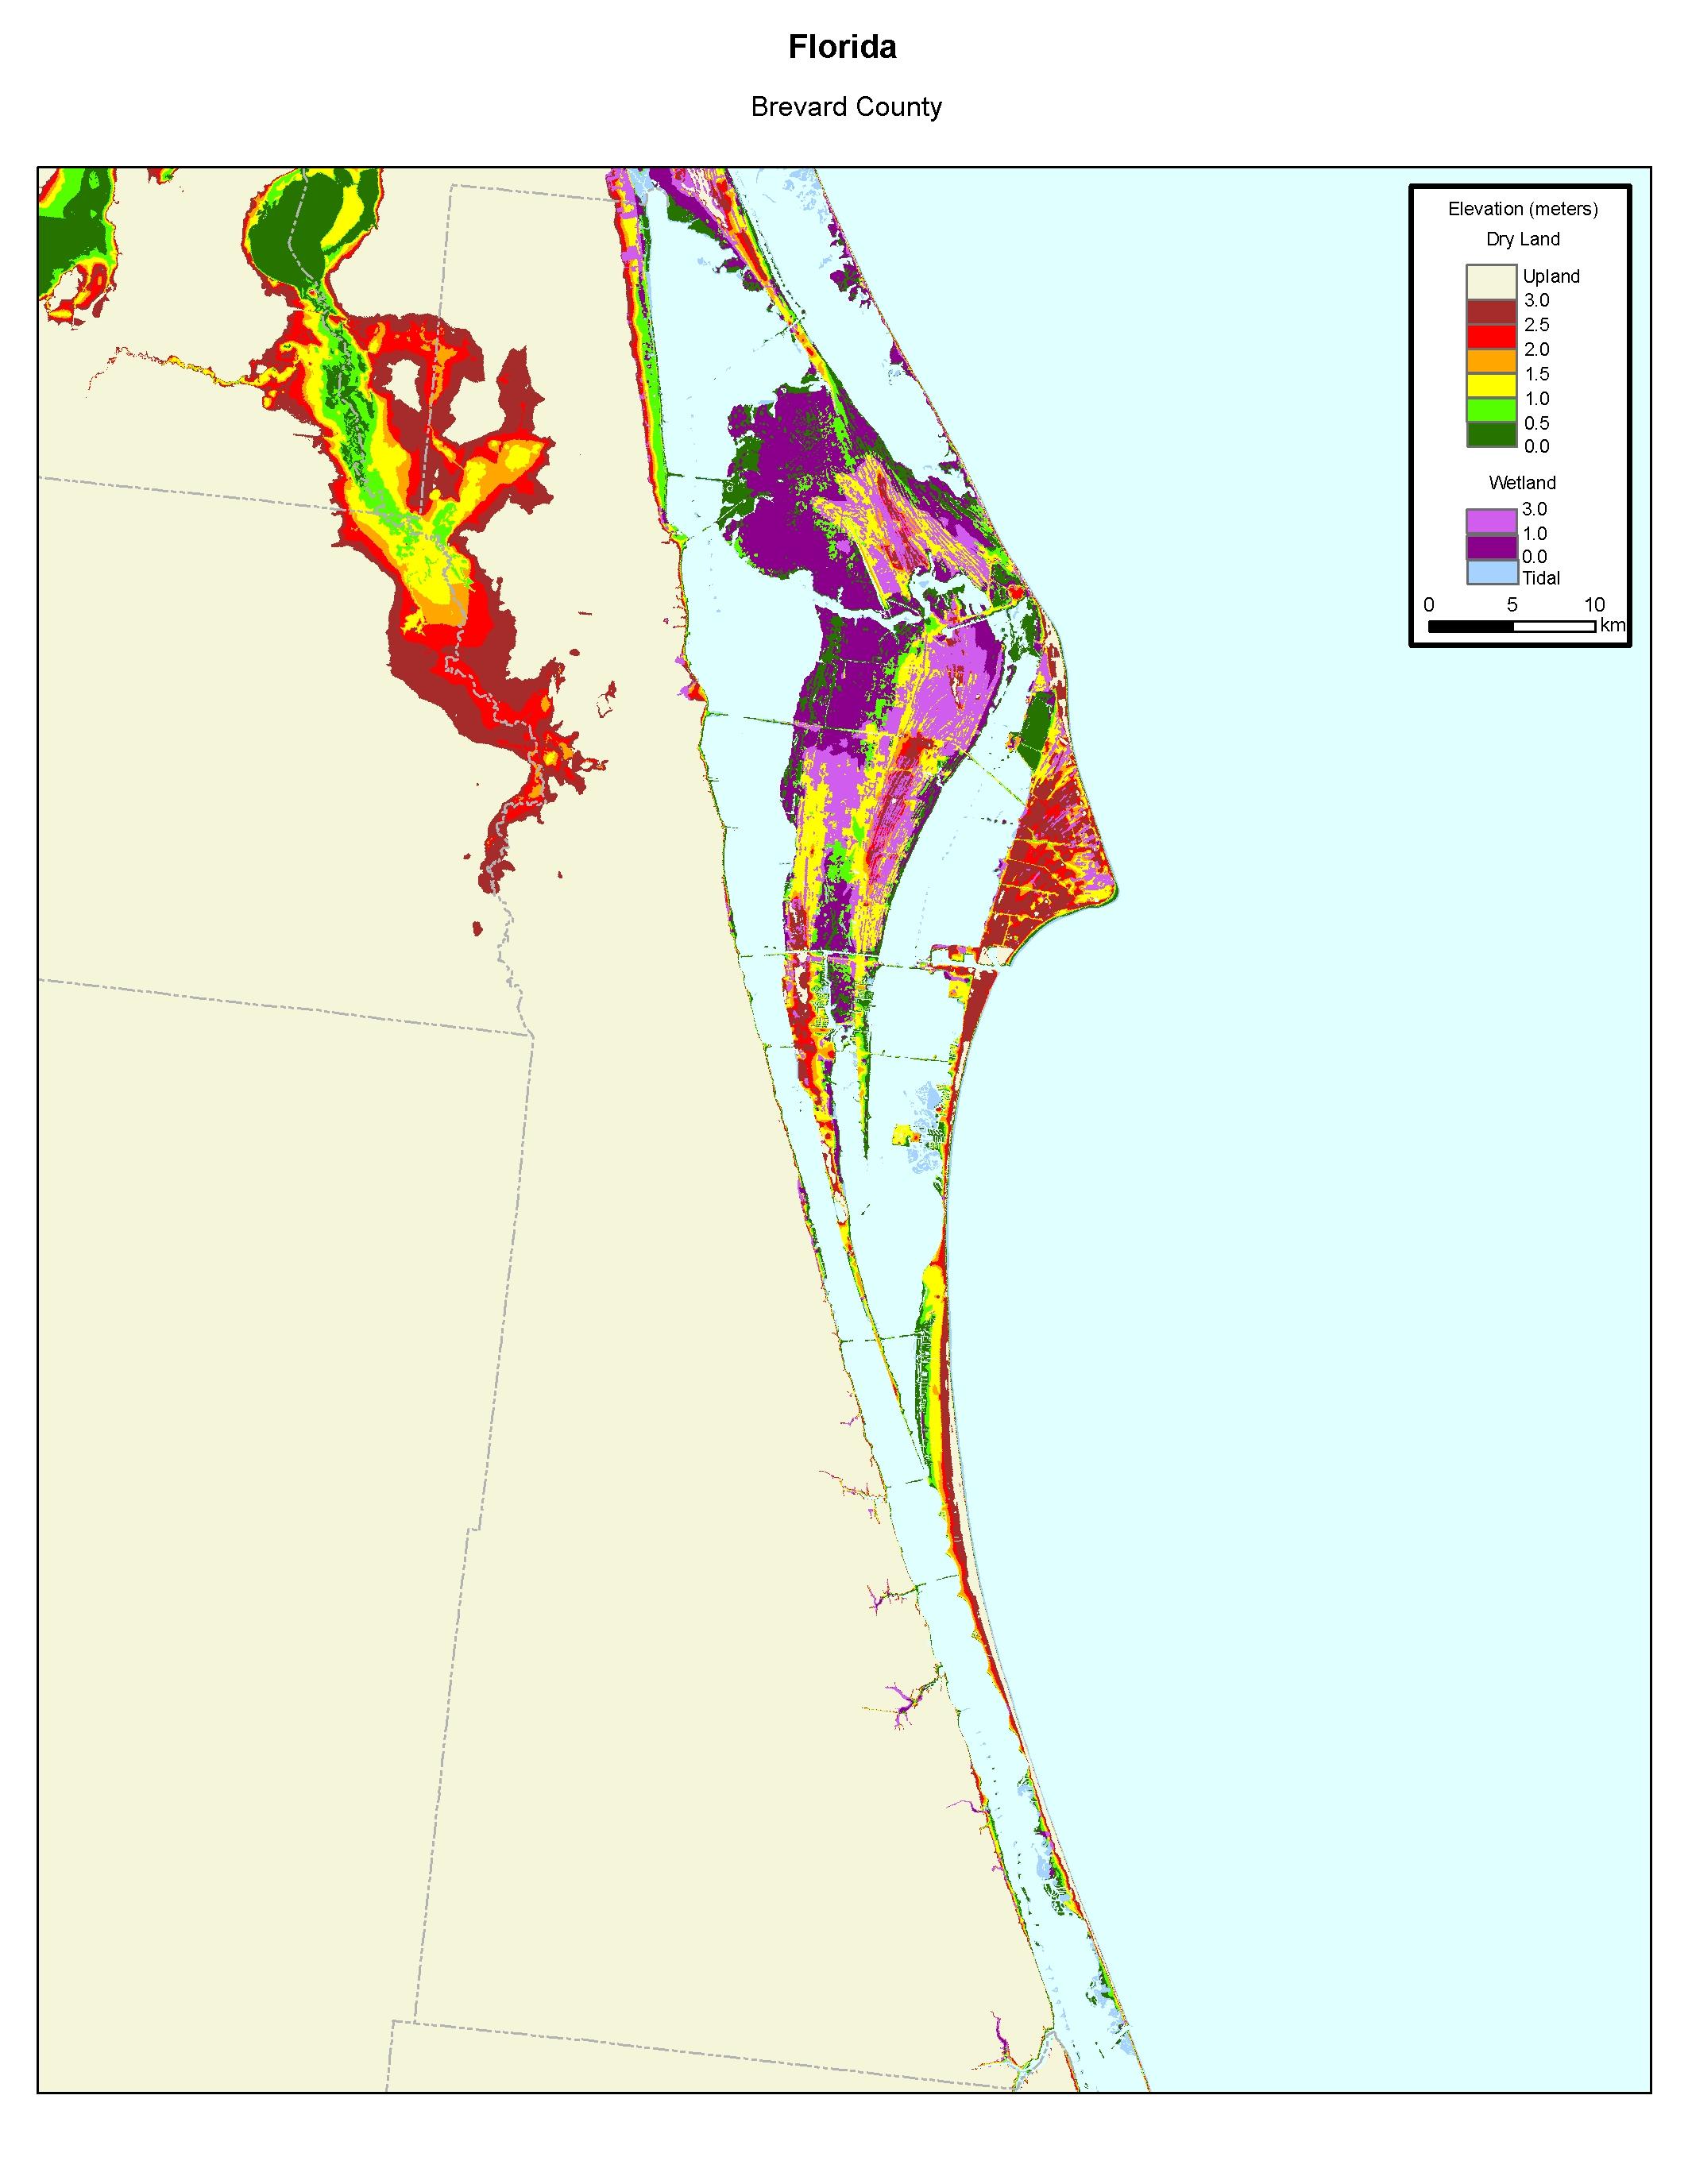 More Sea Level Rise Maps Of Florida's Atlantic Coast - Florida Atlantic Coast Map